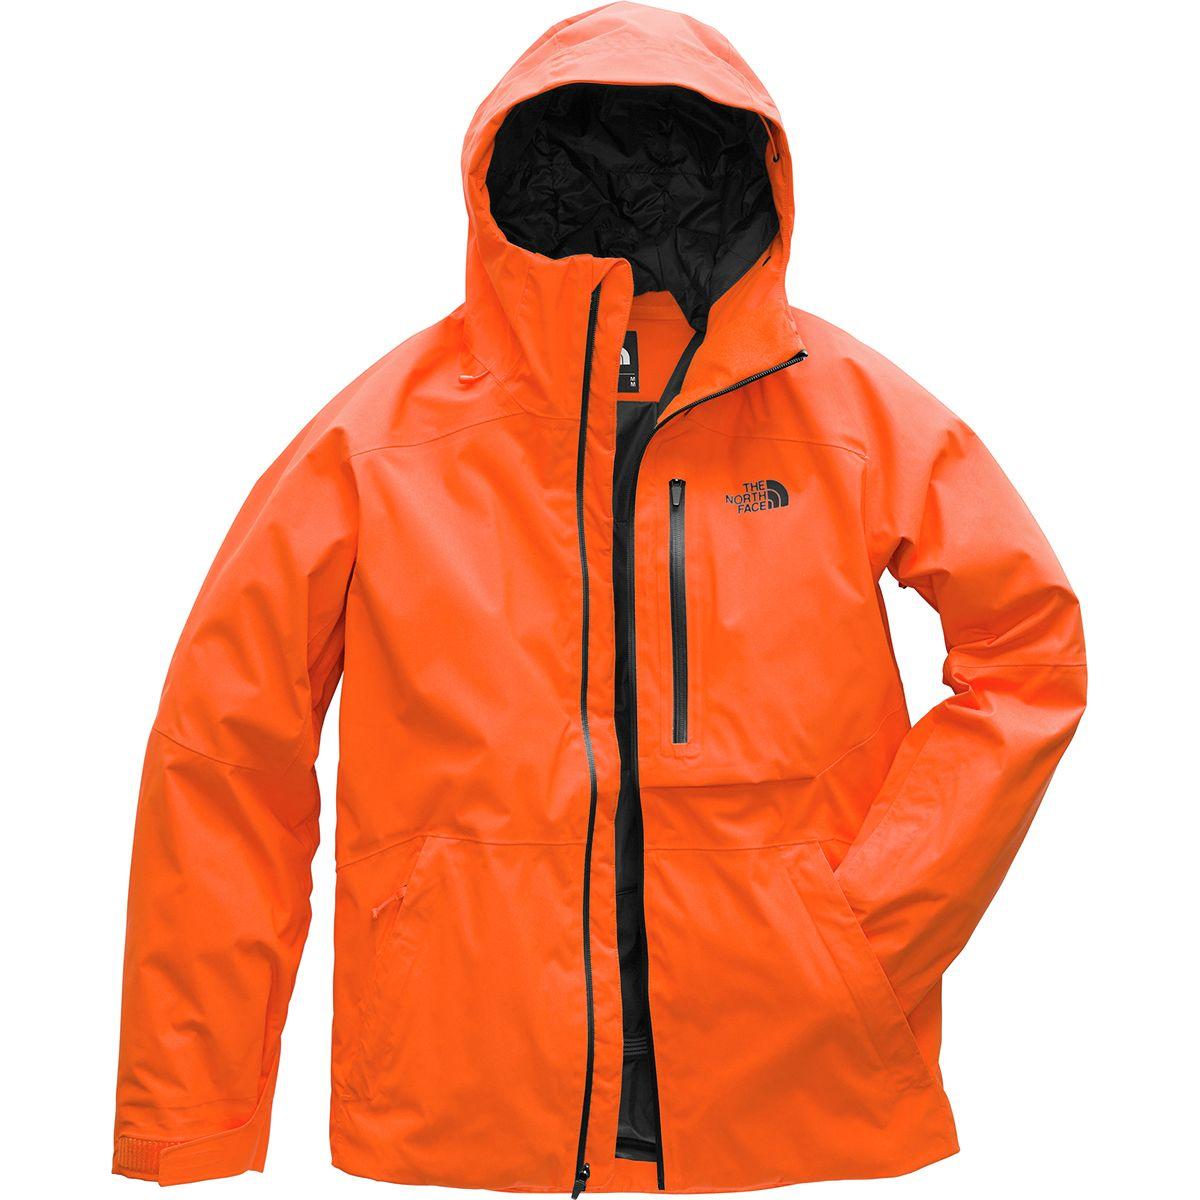 The North Face Sickline Jacket